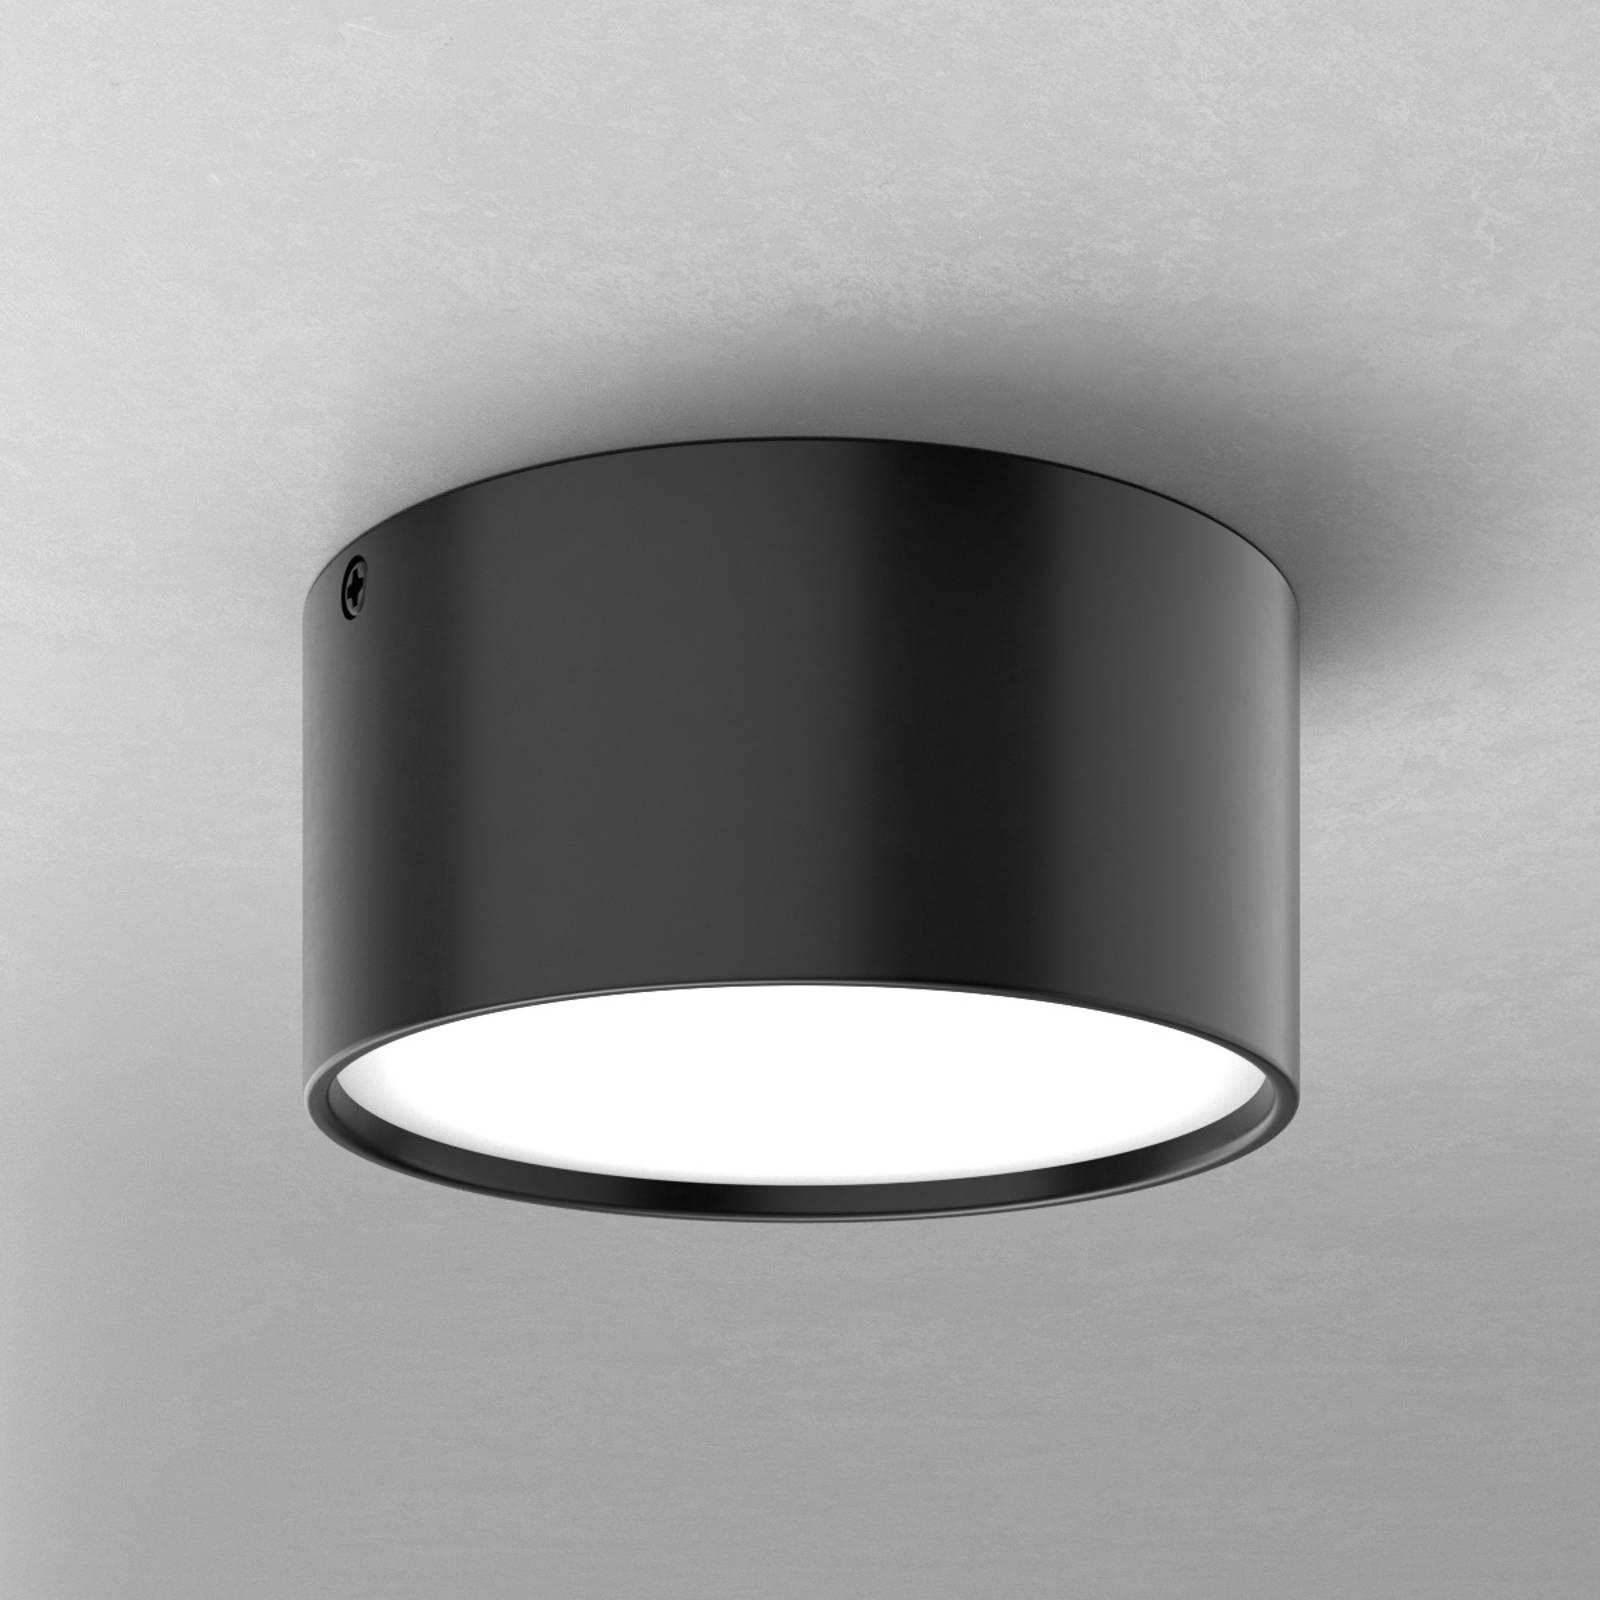 LED plafondlamp Mine in zwart, 12 cm